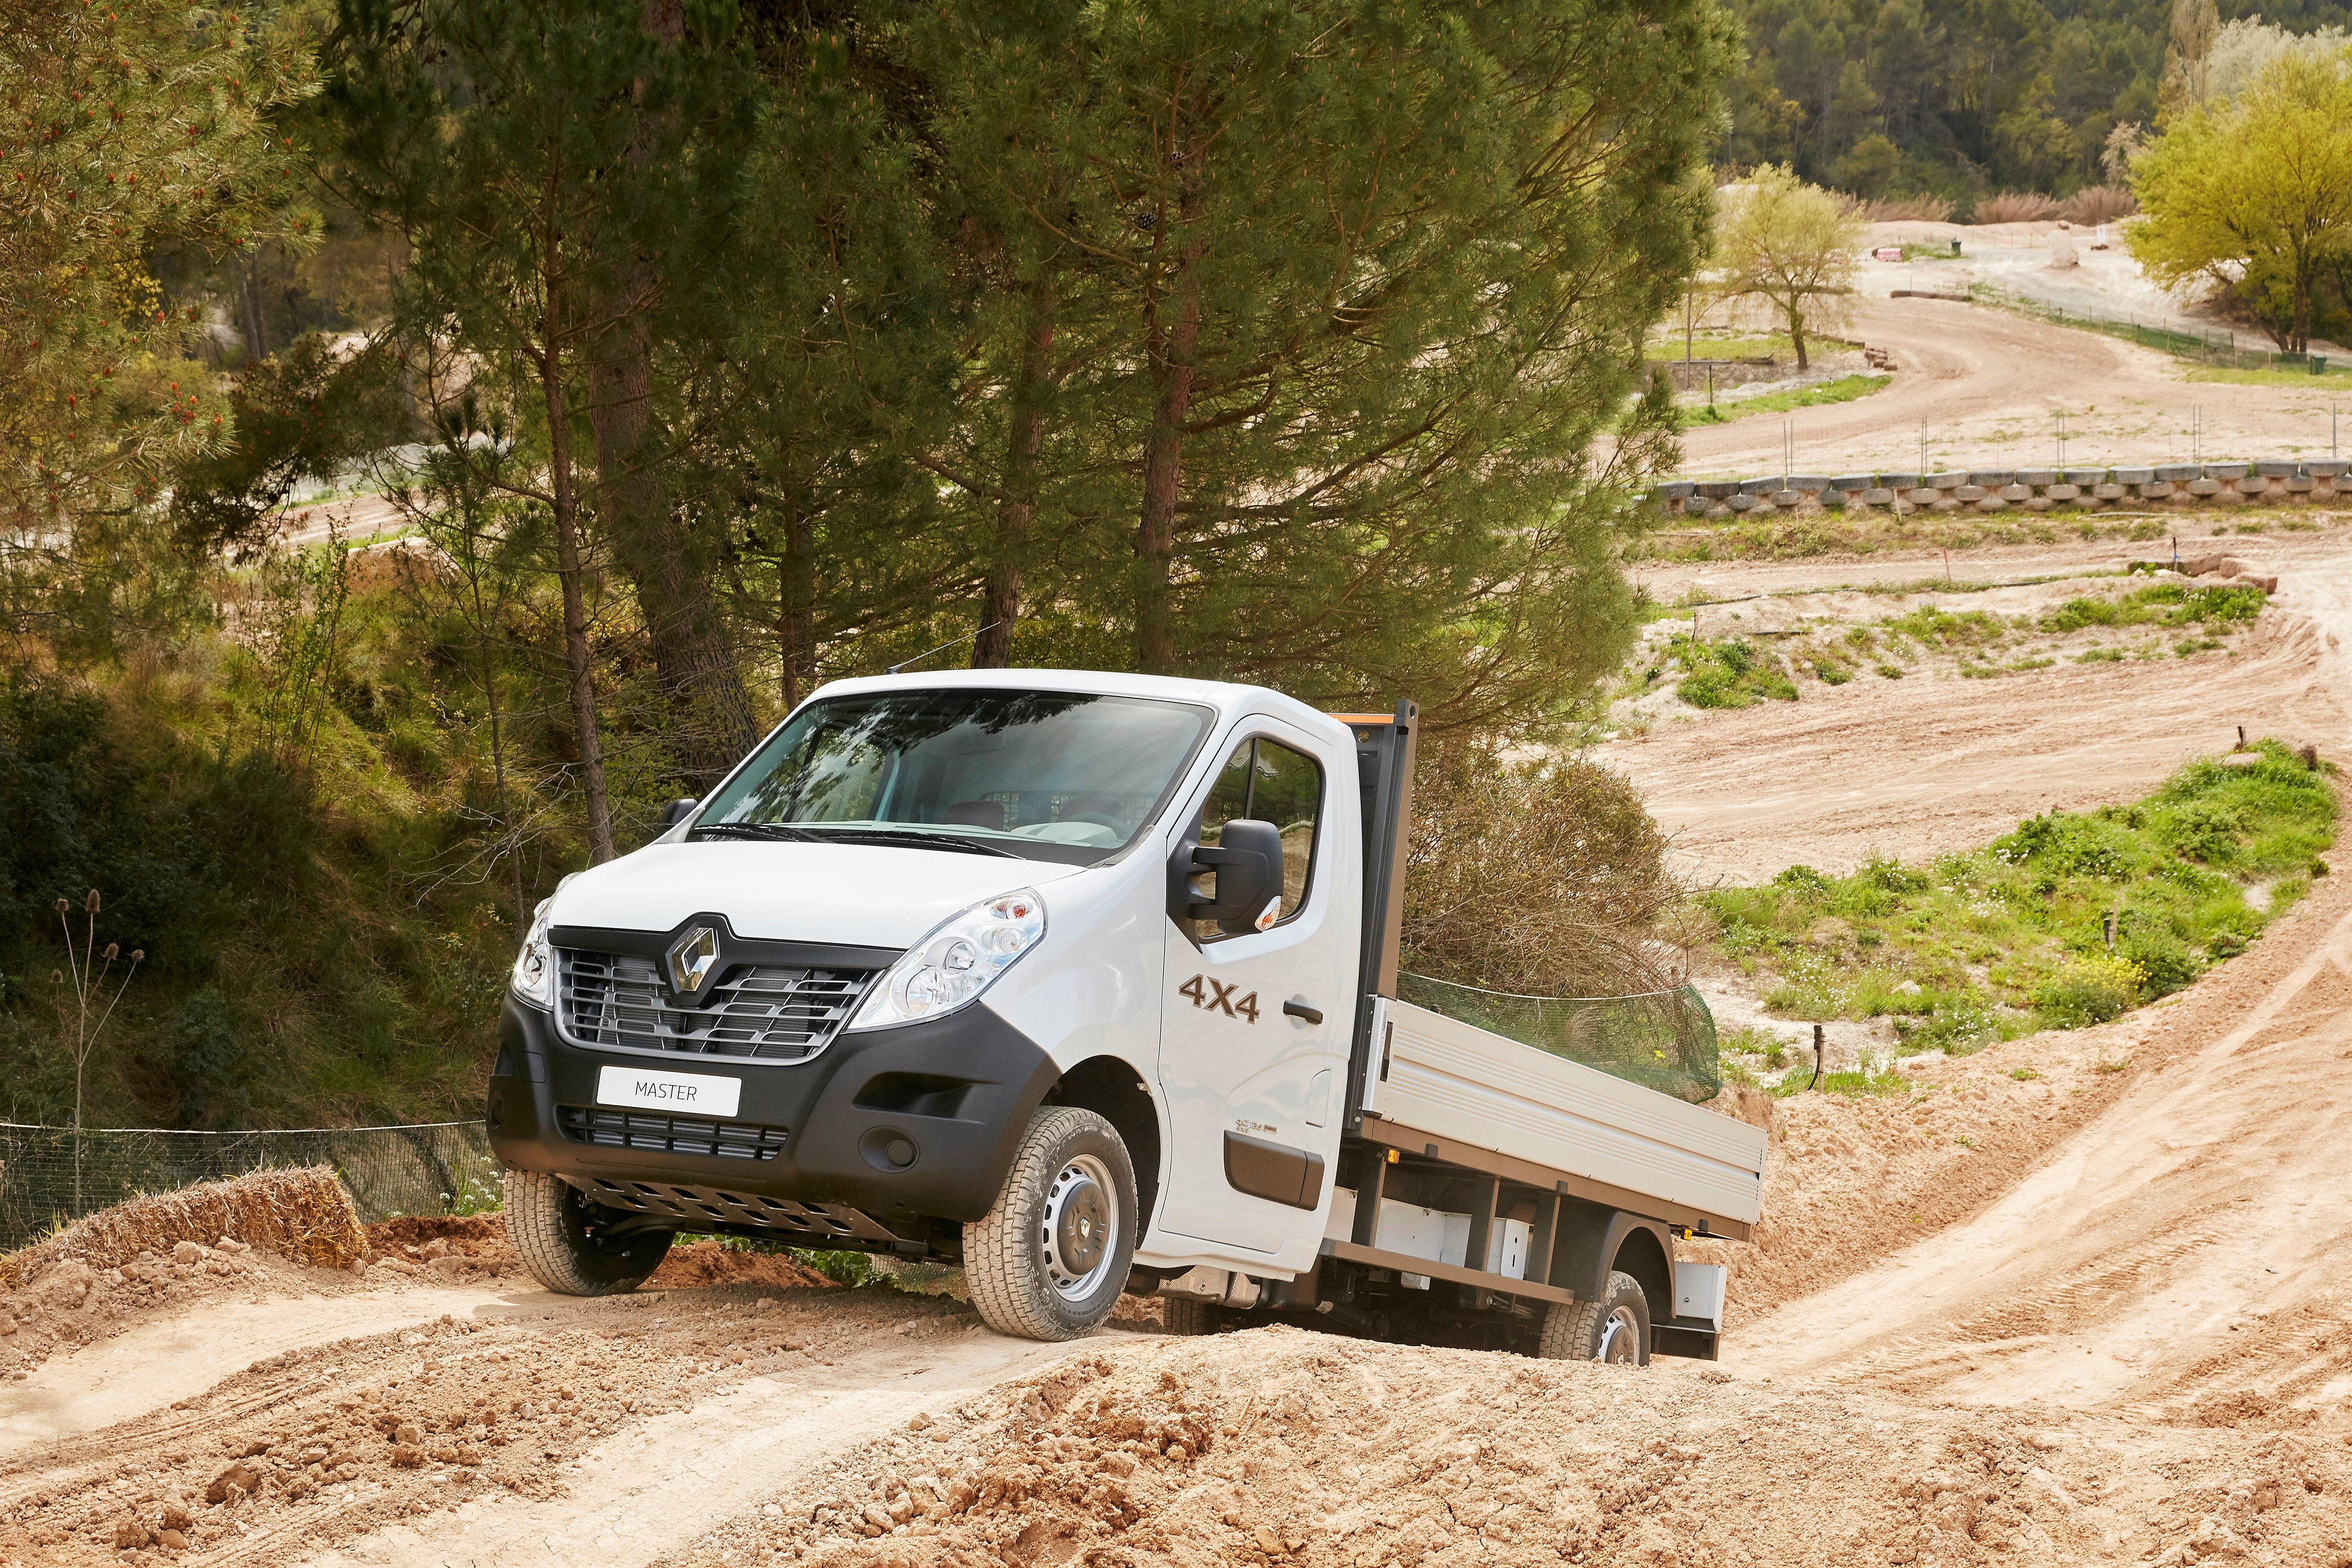 Renault X-Track e Master 4X4